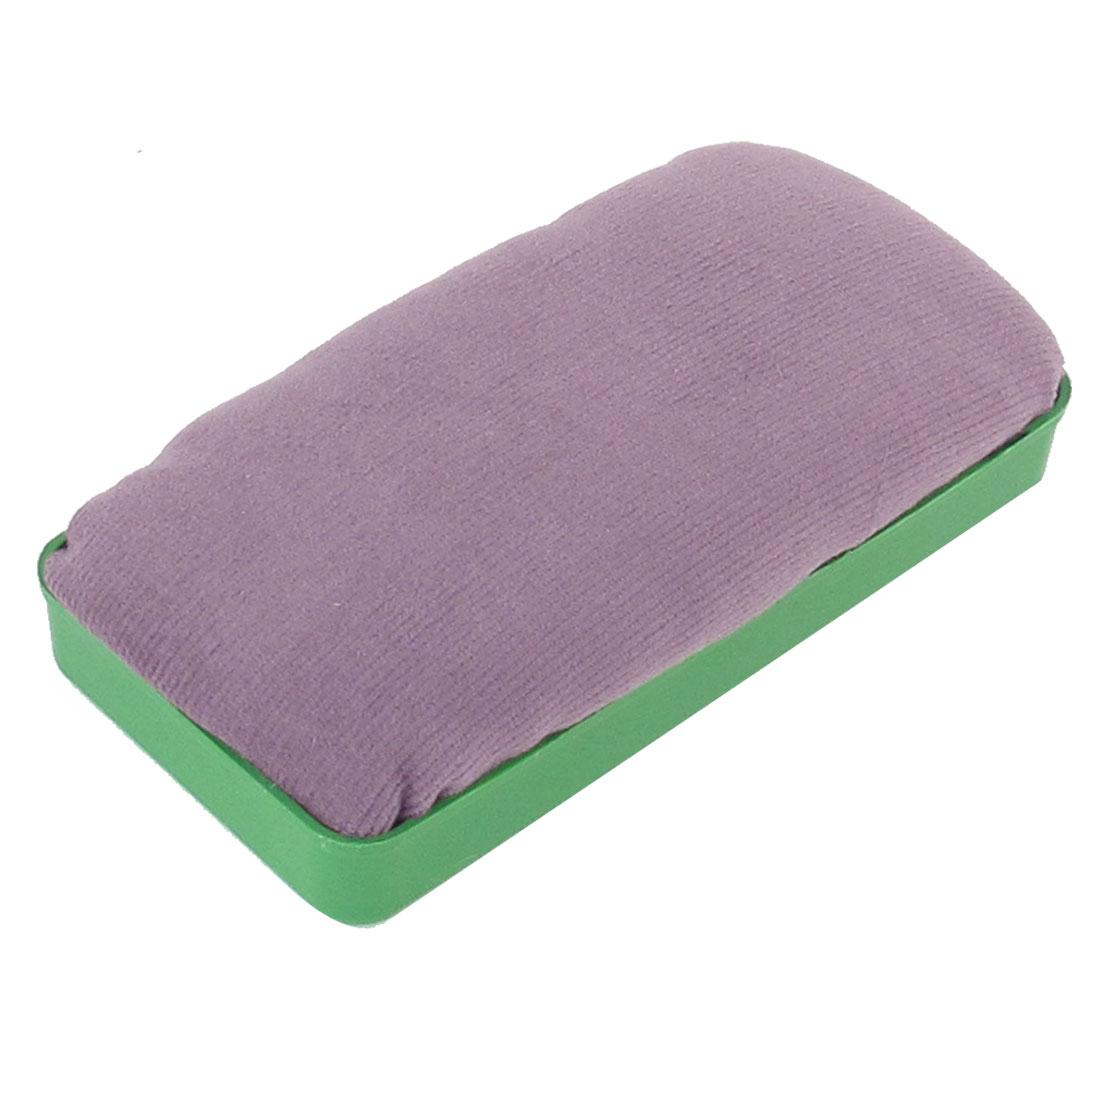 Stationery Foam Felt Dry Magnetic Eraser Green Lavender Color for Whiteboard